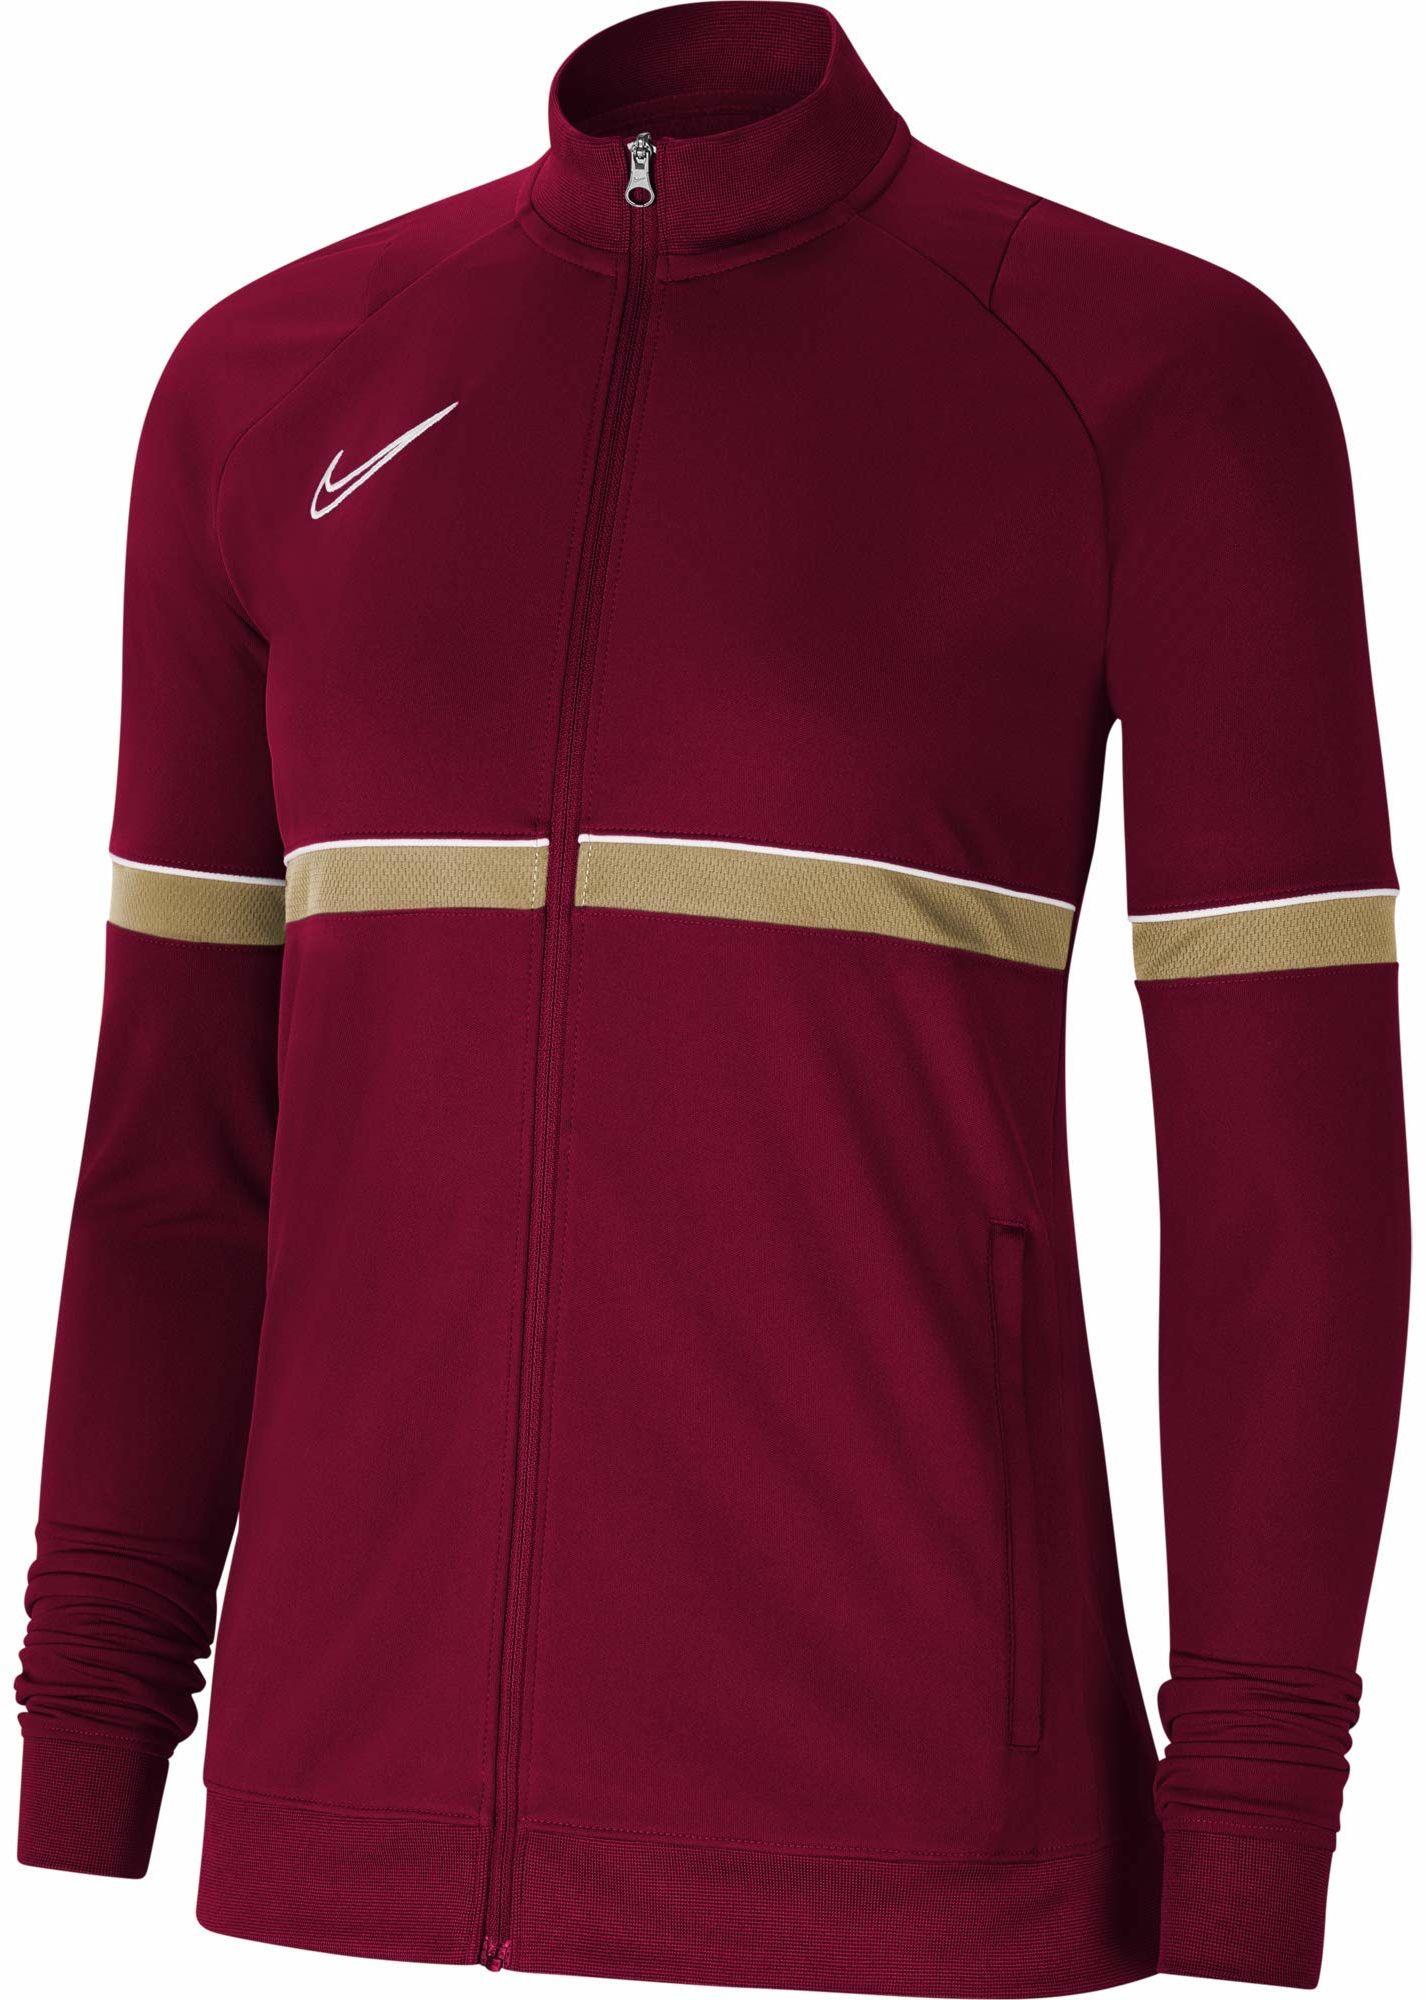 Nike Damska kurtka damska Academy 21 Track Jacket Team Red/White/Jersey Gold/White XS